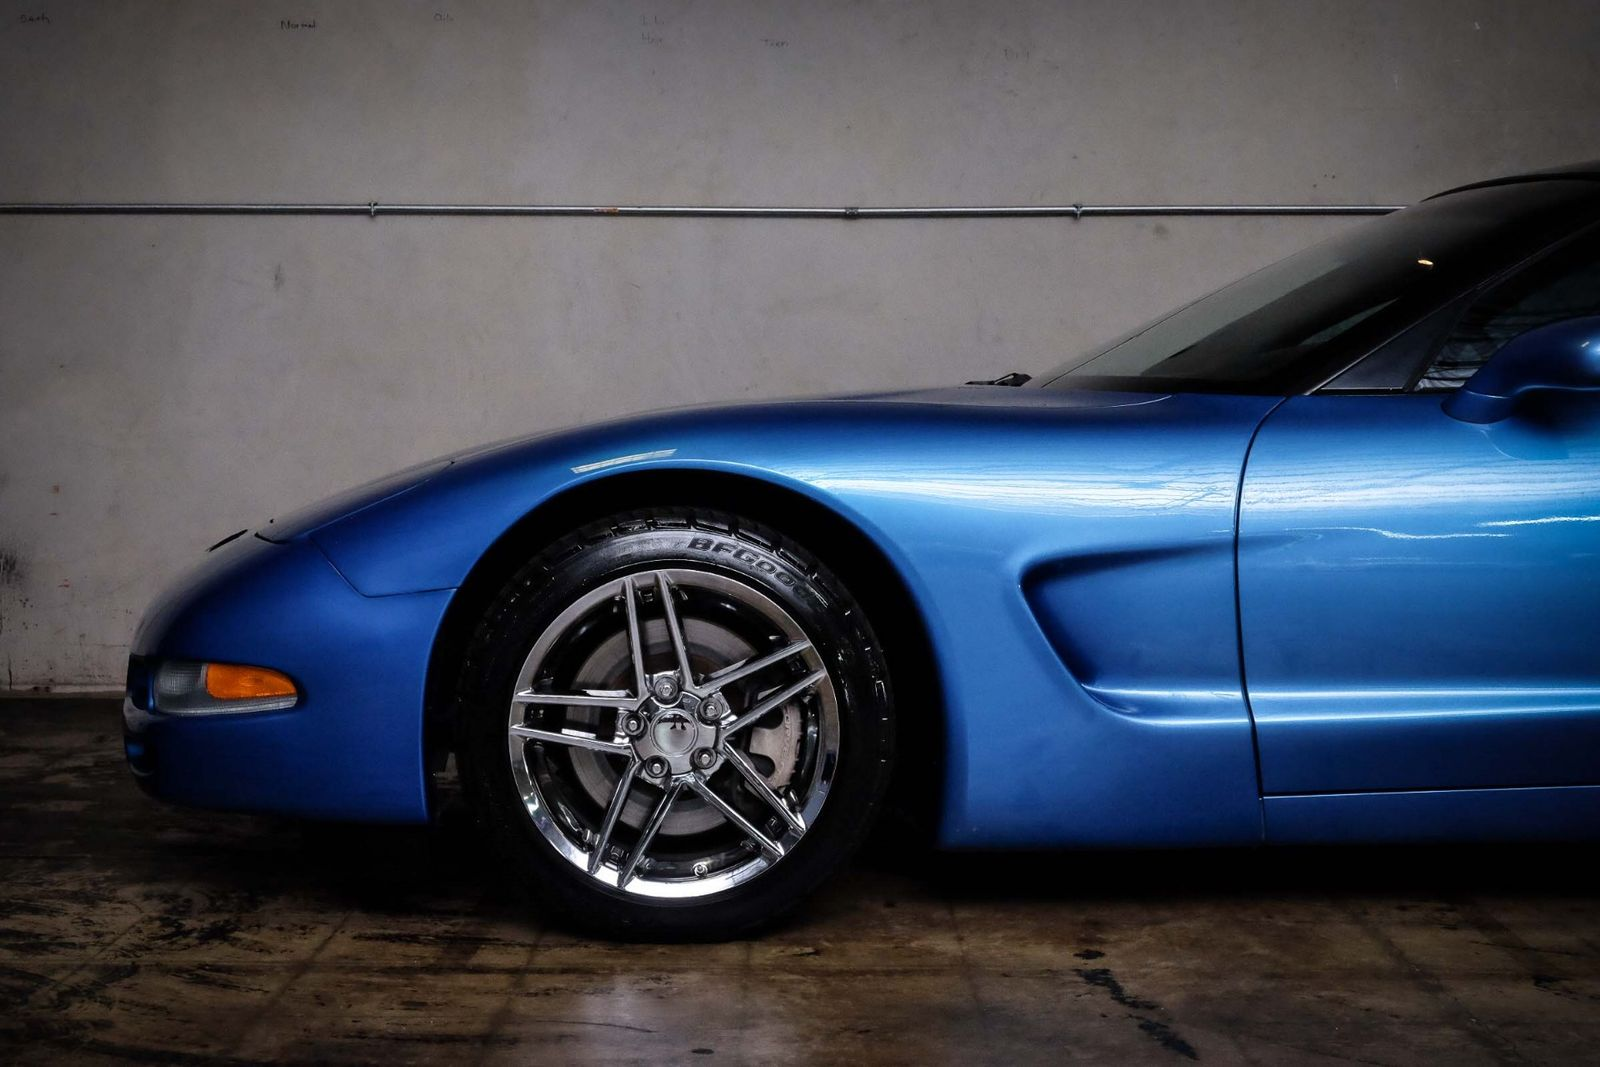 2000 Blue Chevrolet Corvette   | C5 Corvette Photo 10